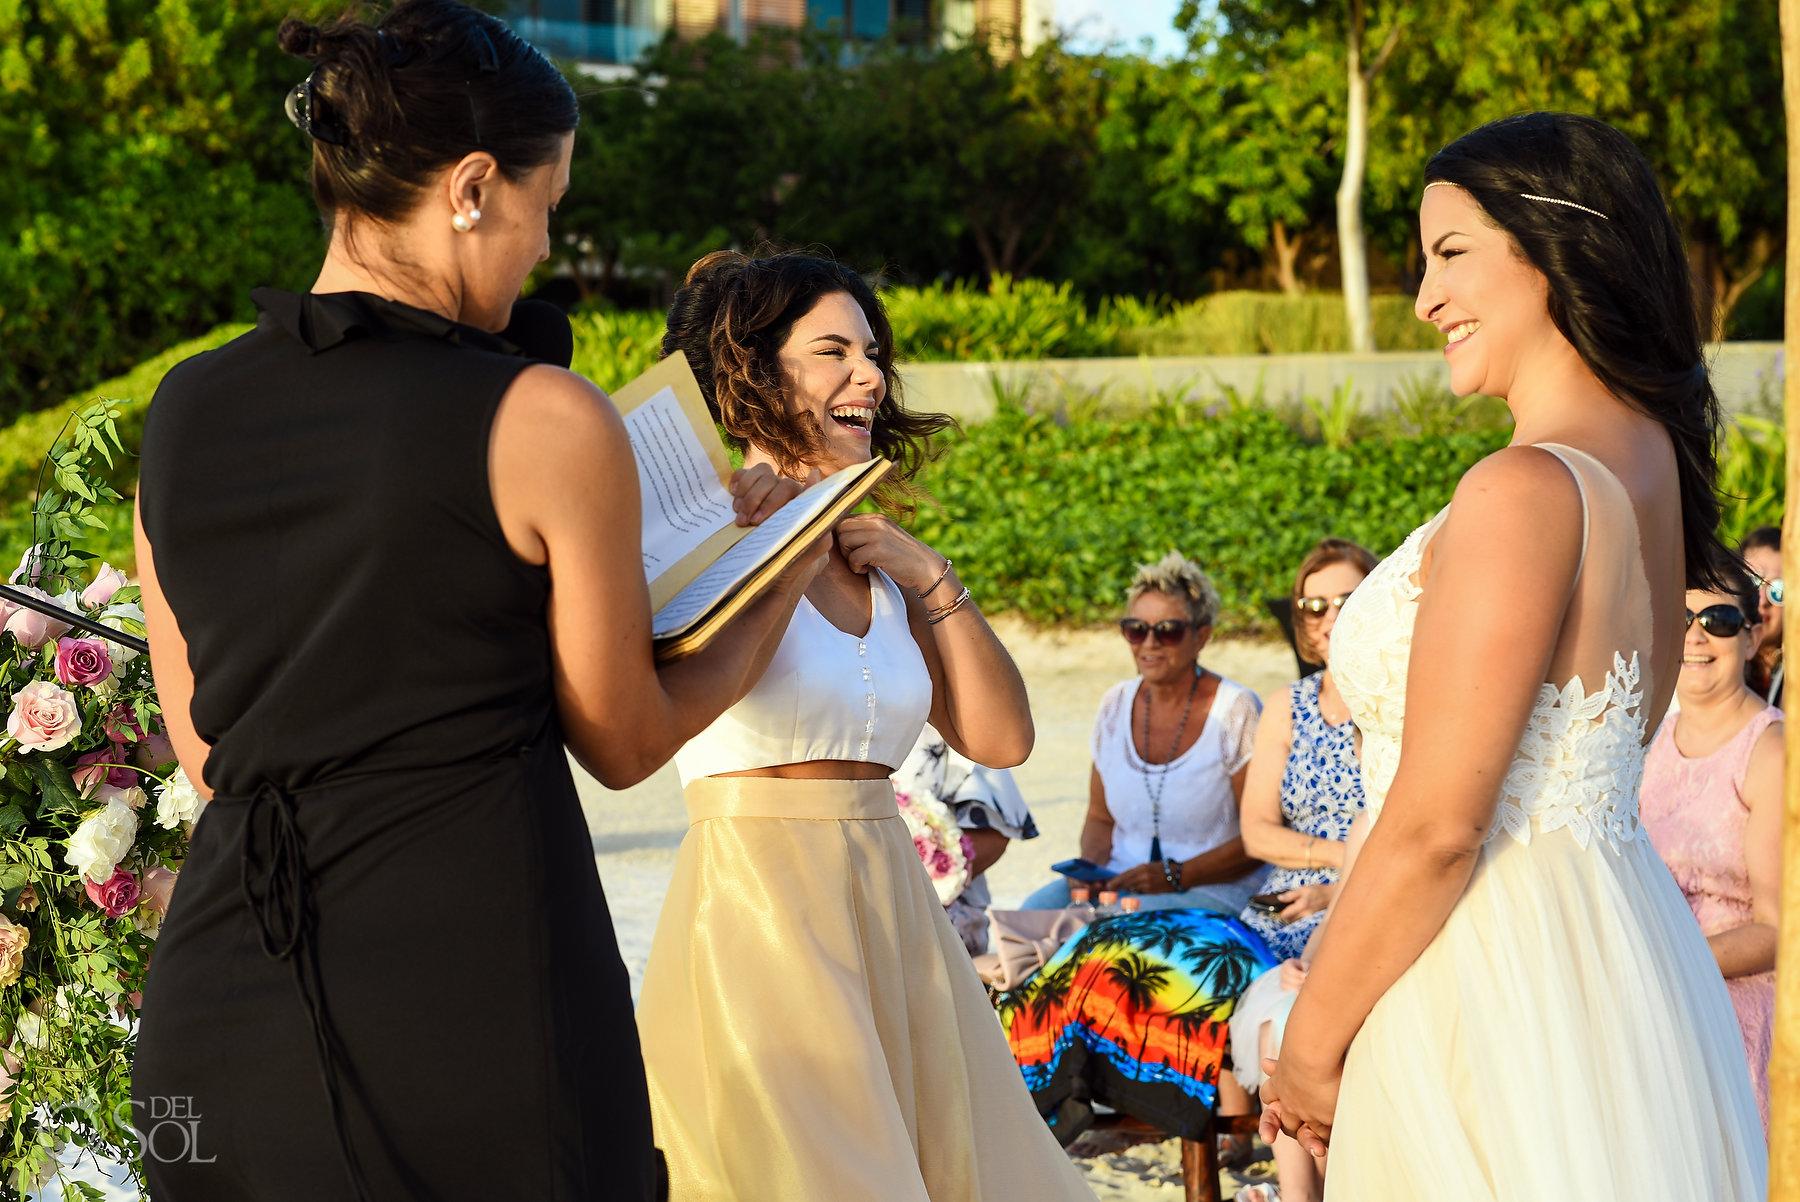 Brides Ceremony Same Sex Nizuc Wedding